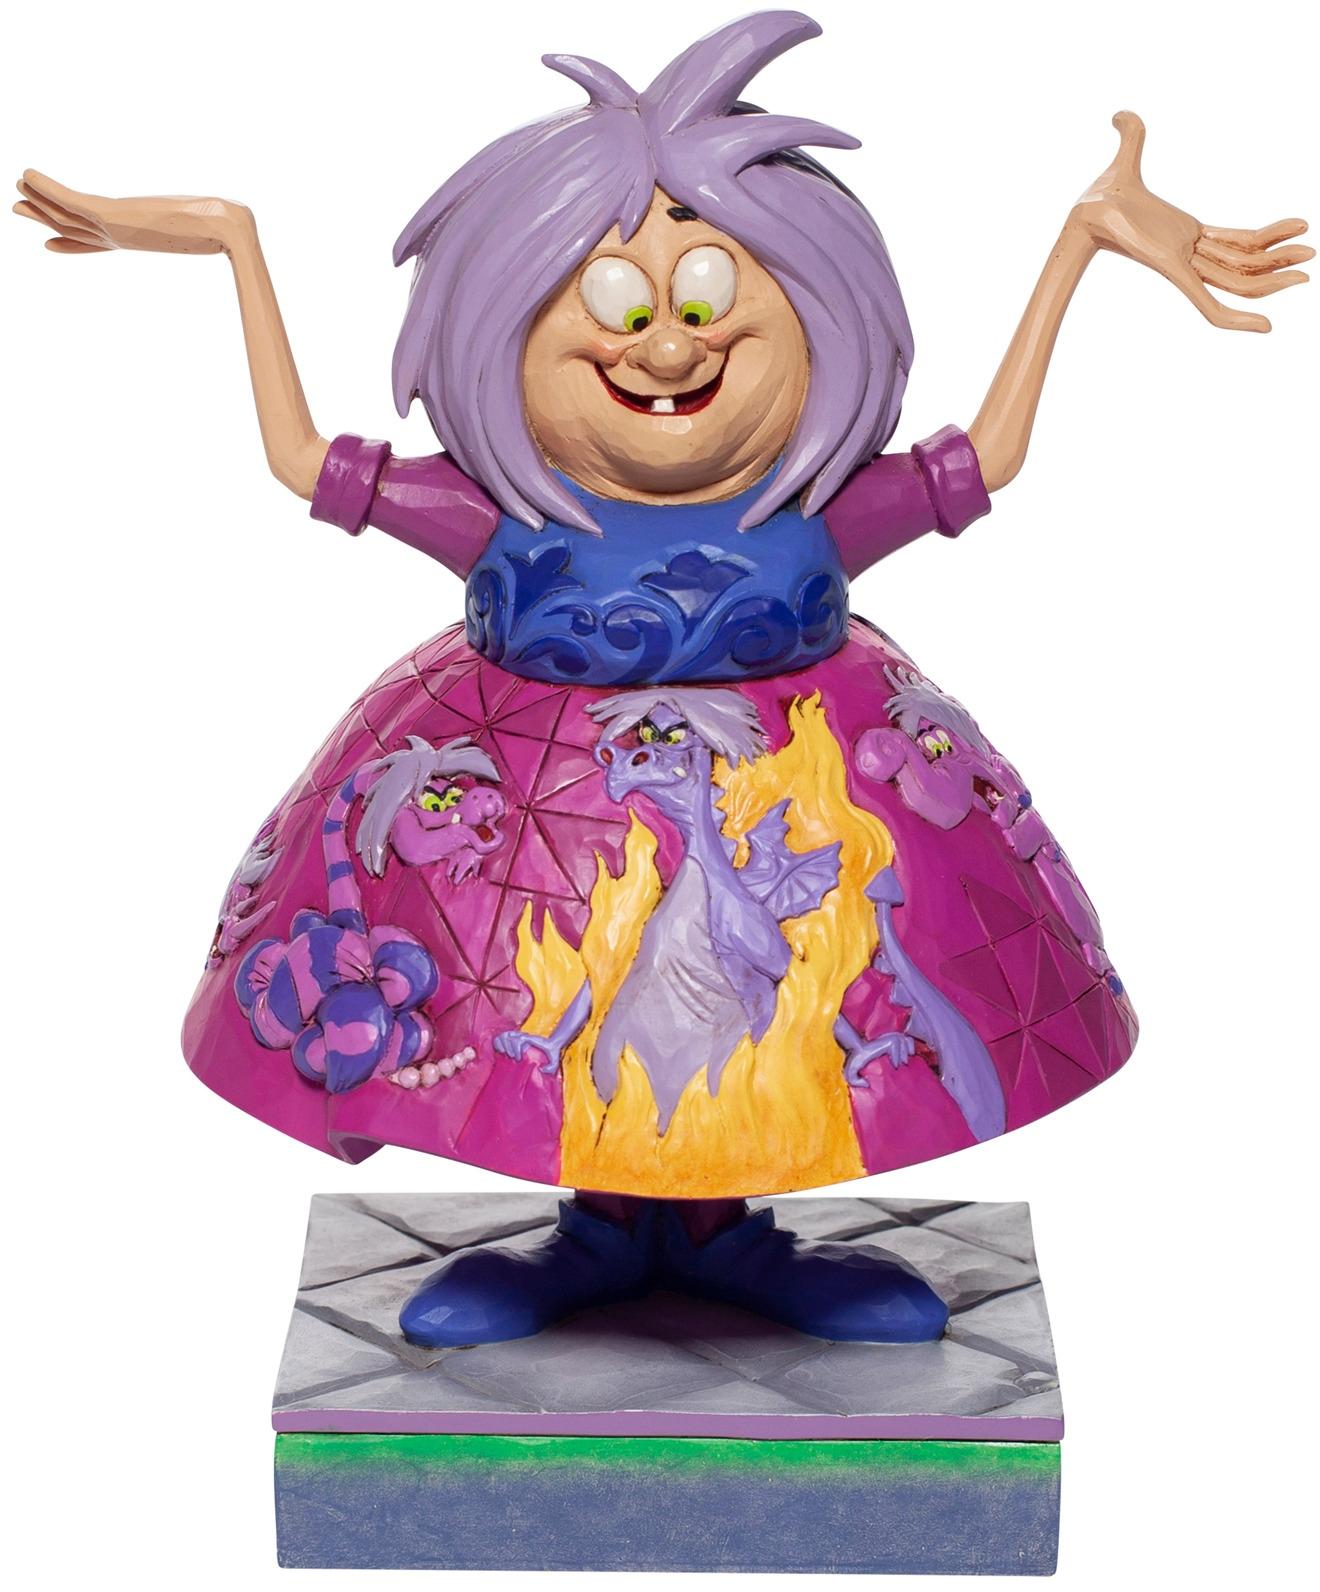 Jim Shore Disney 6007072 Madam Mim Figurine